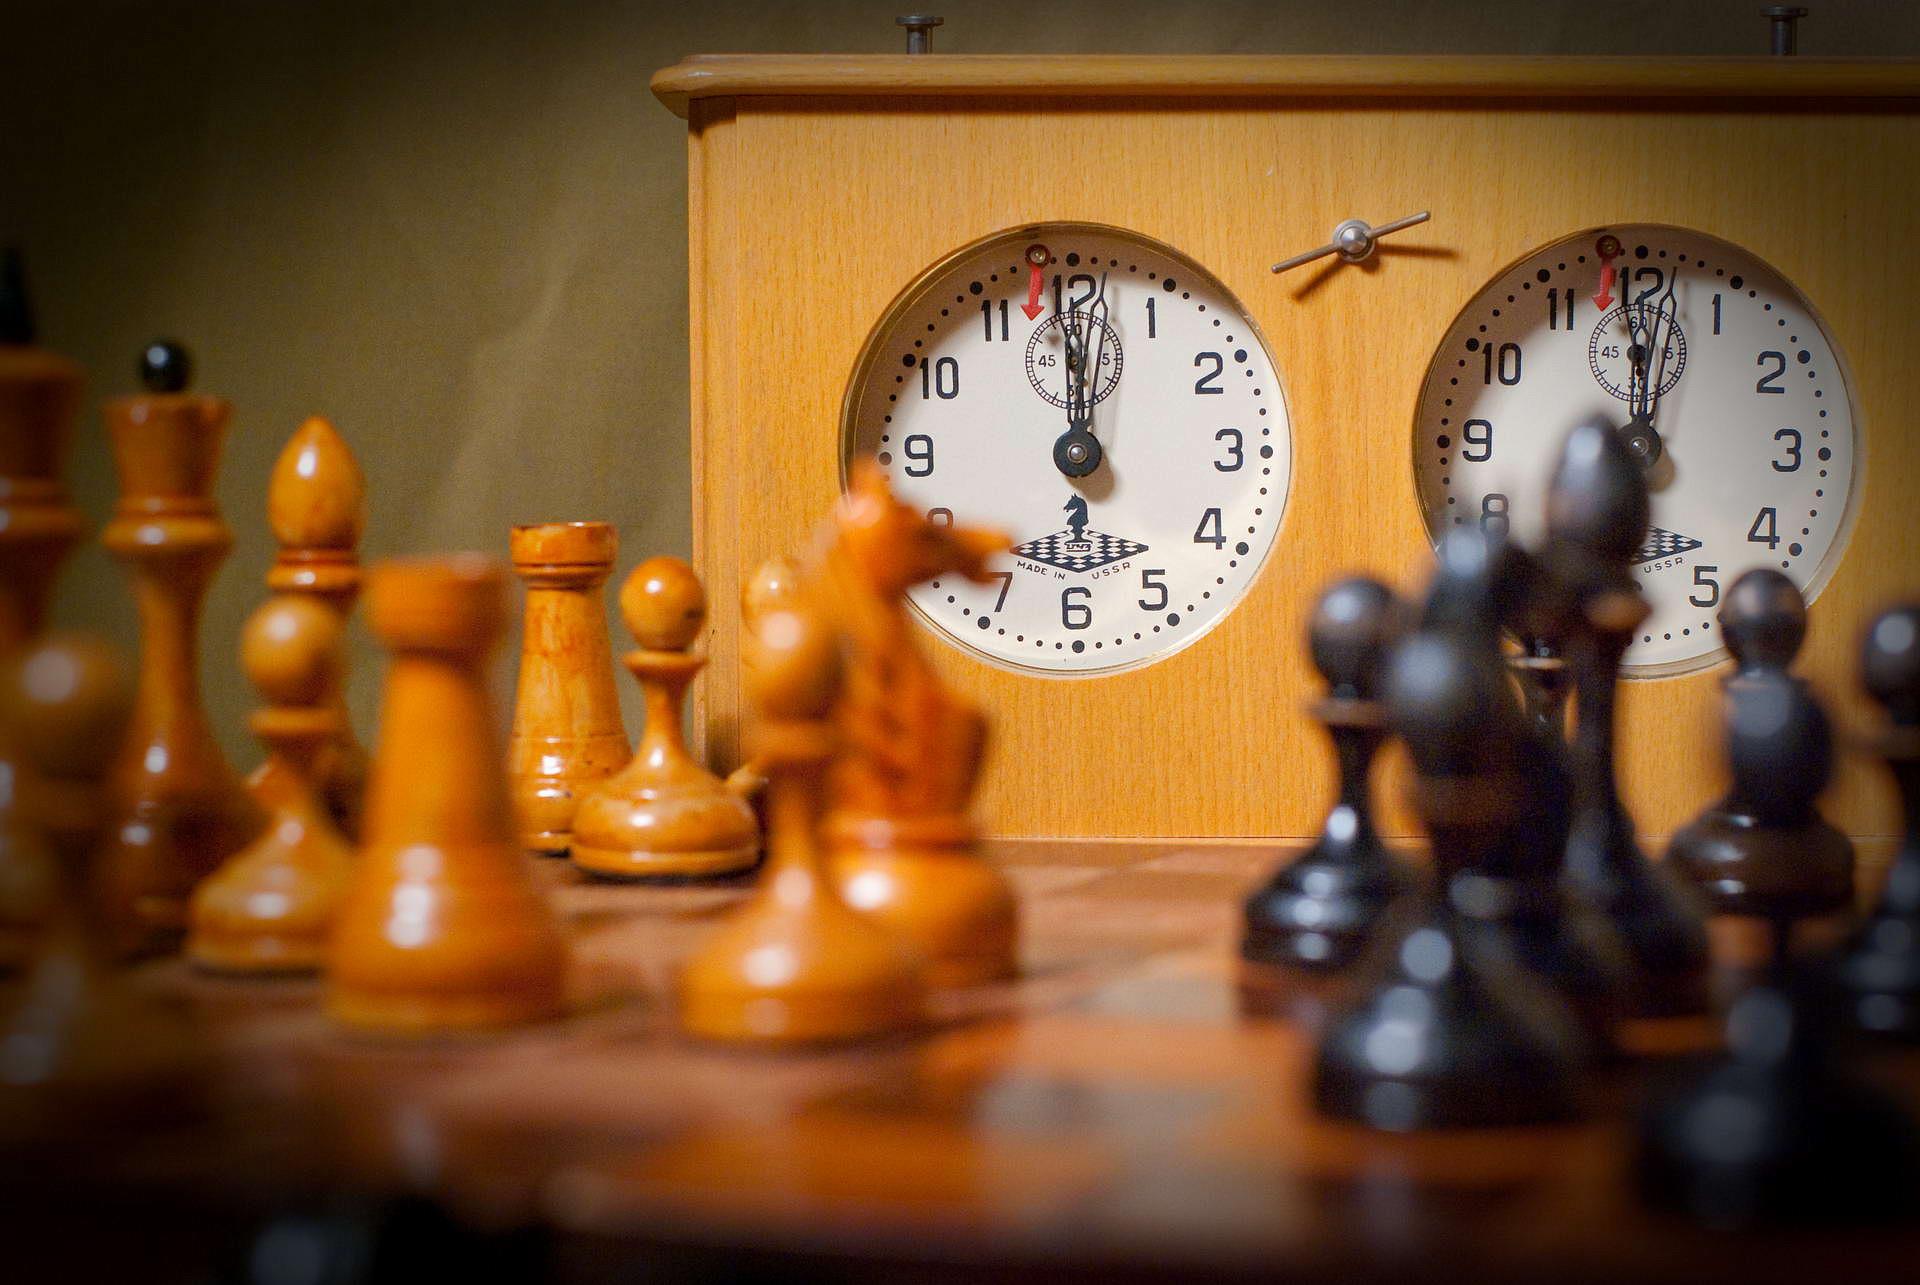 блог картинка шахматного турнира рисковал, крутясь кругу